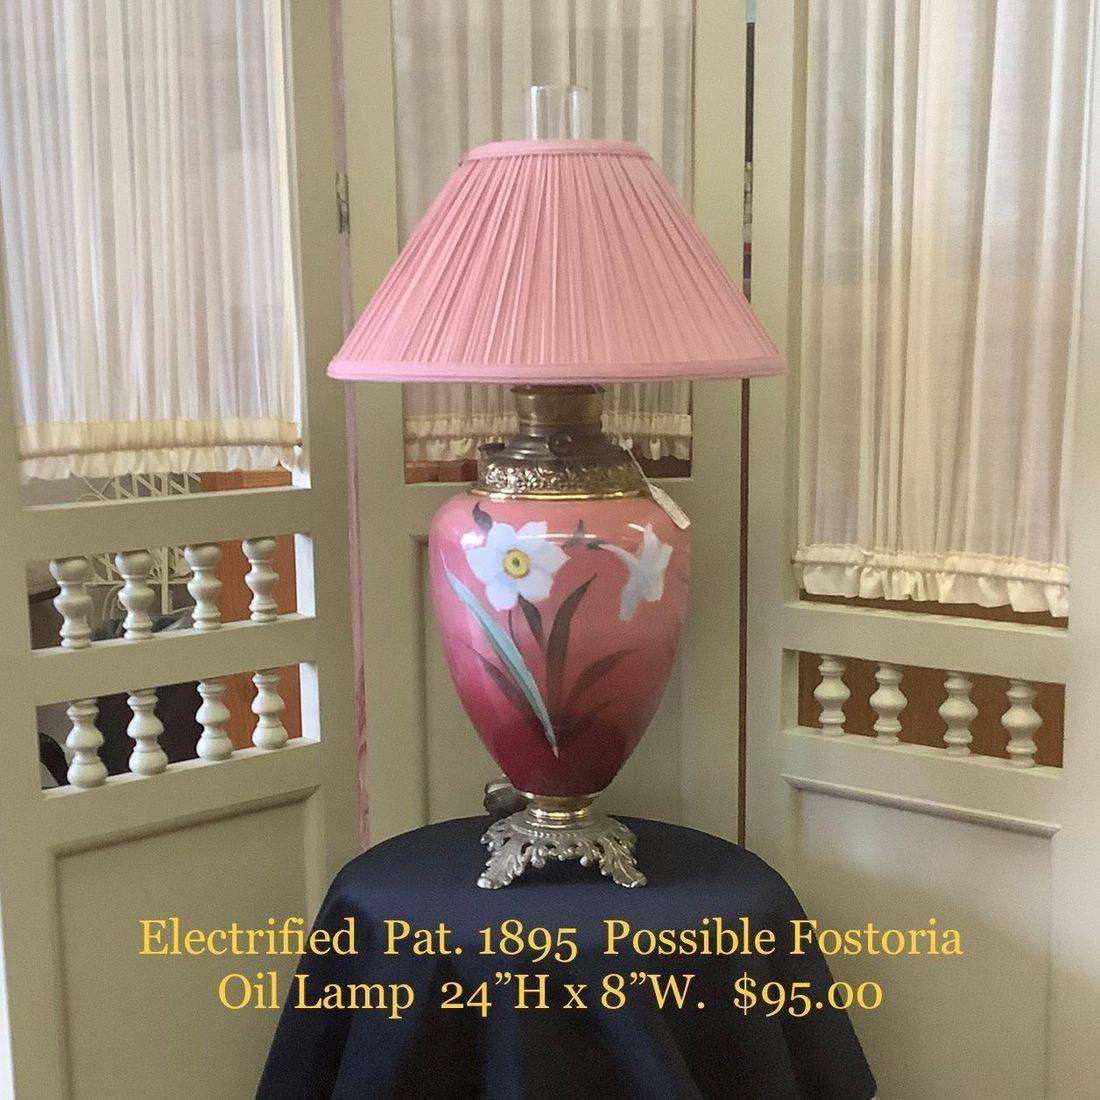 Pat. 1895 Possible Fostoria, Electrified Oil Lamp